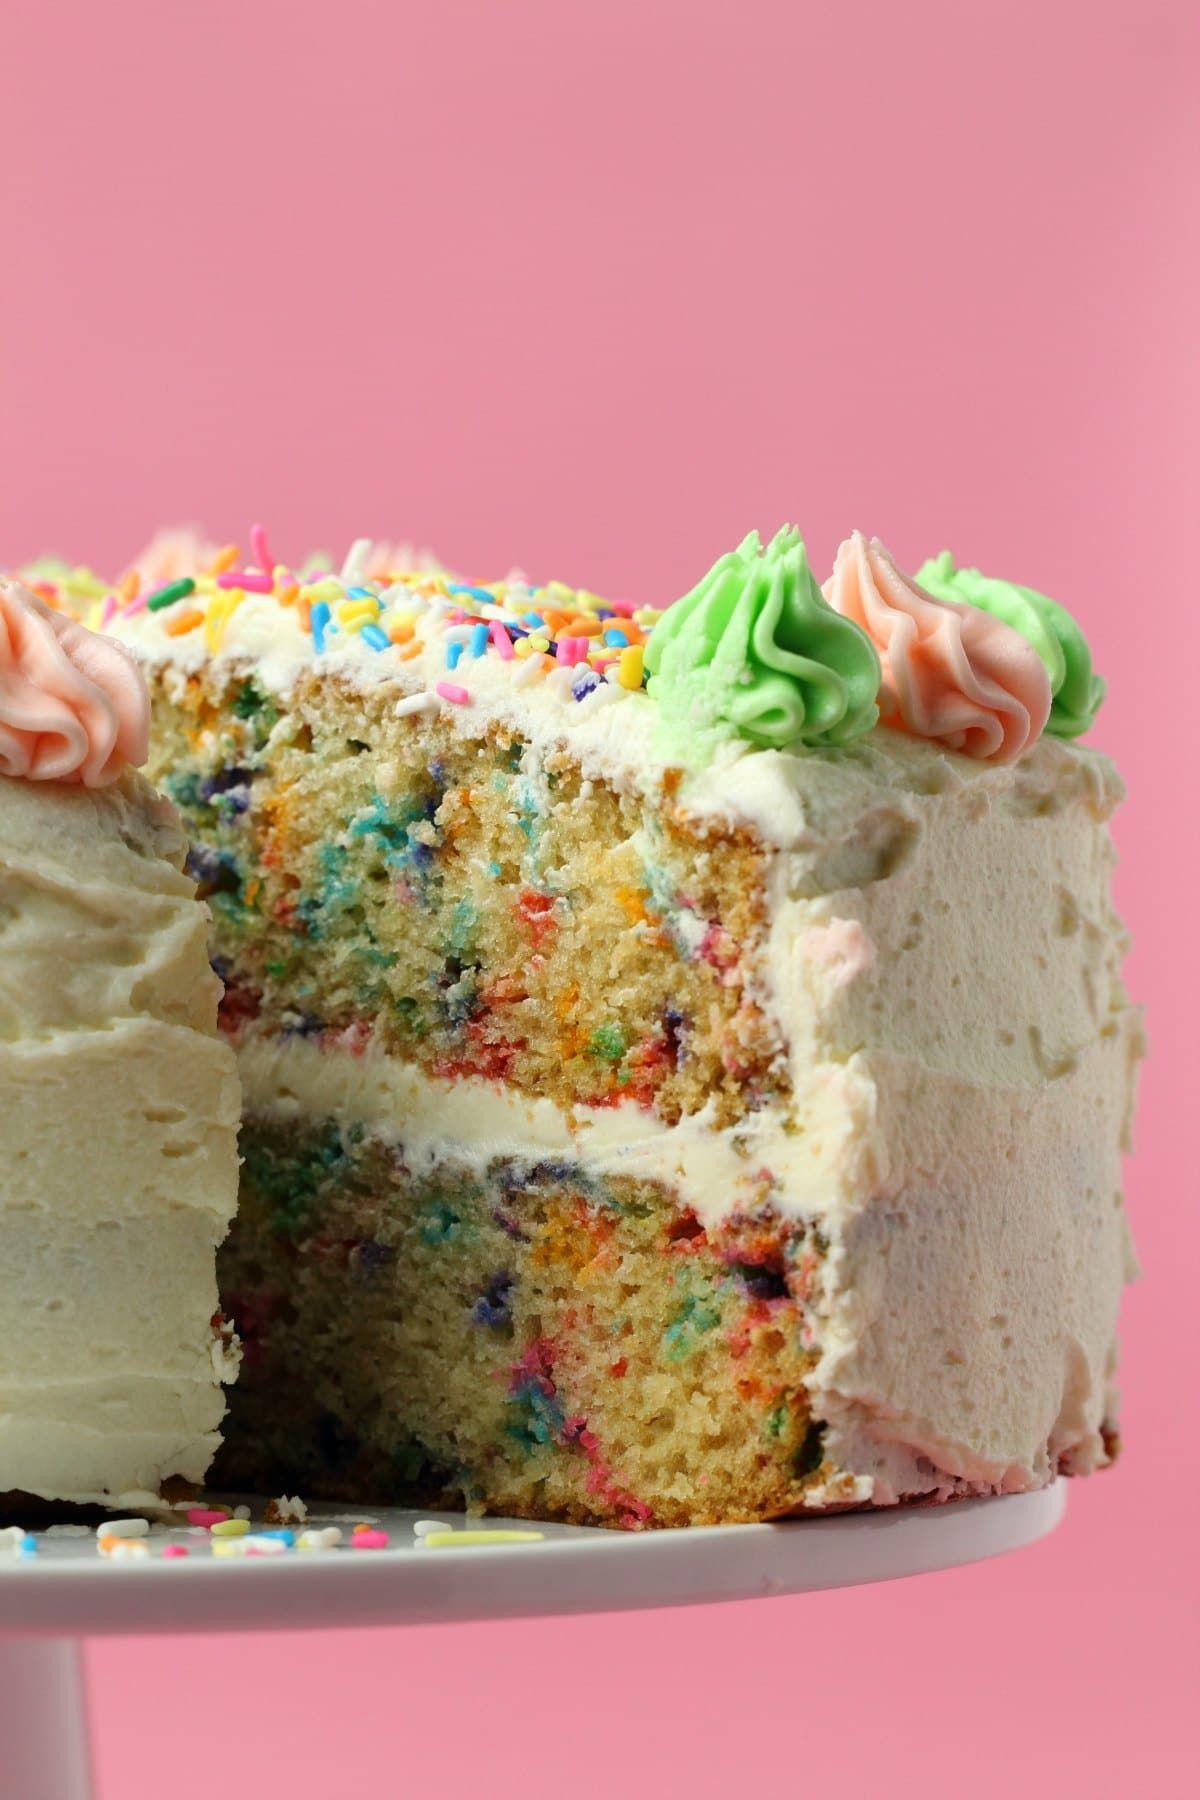 Colorful and festive vegan funfetti cake this